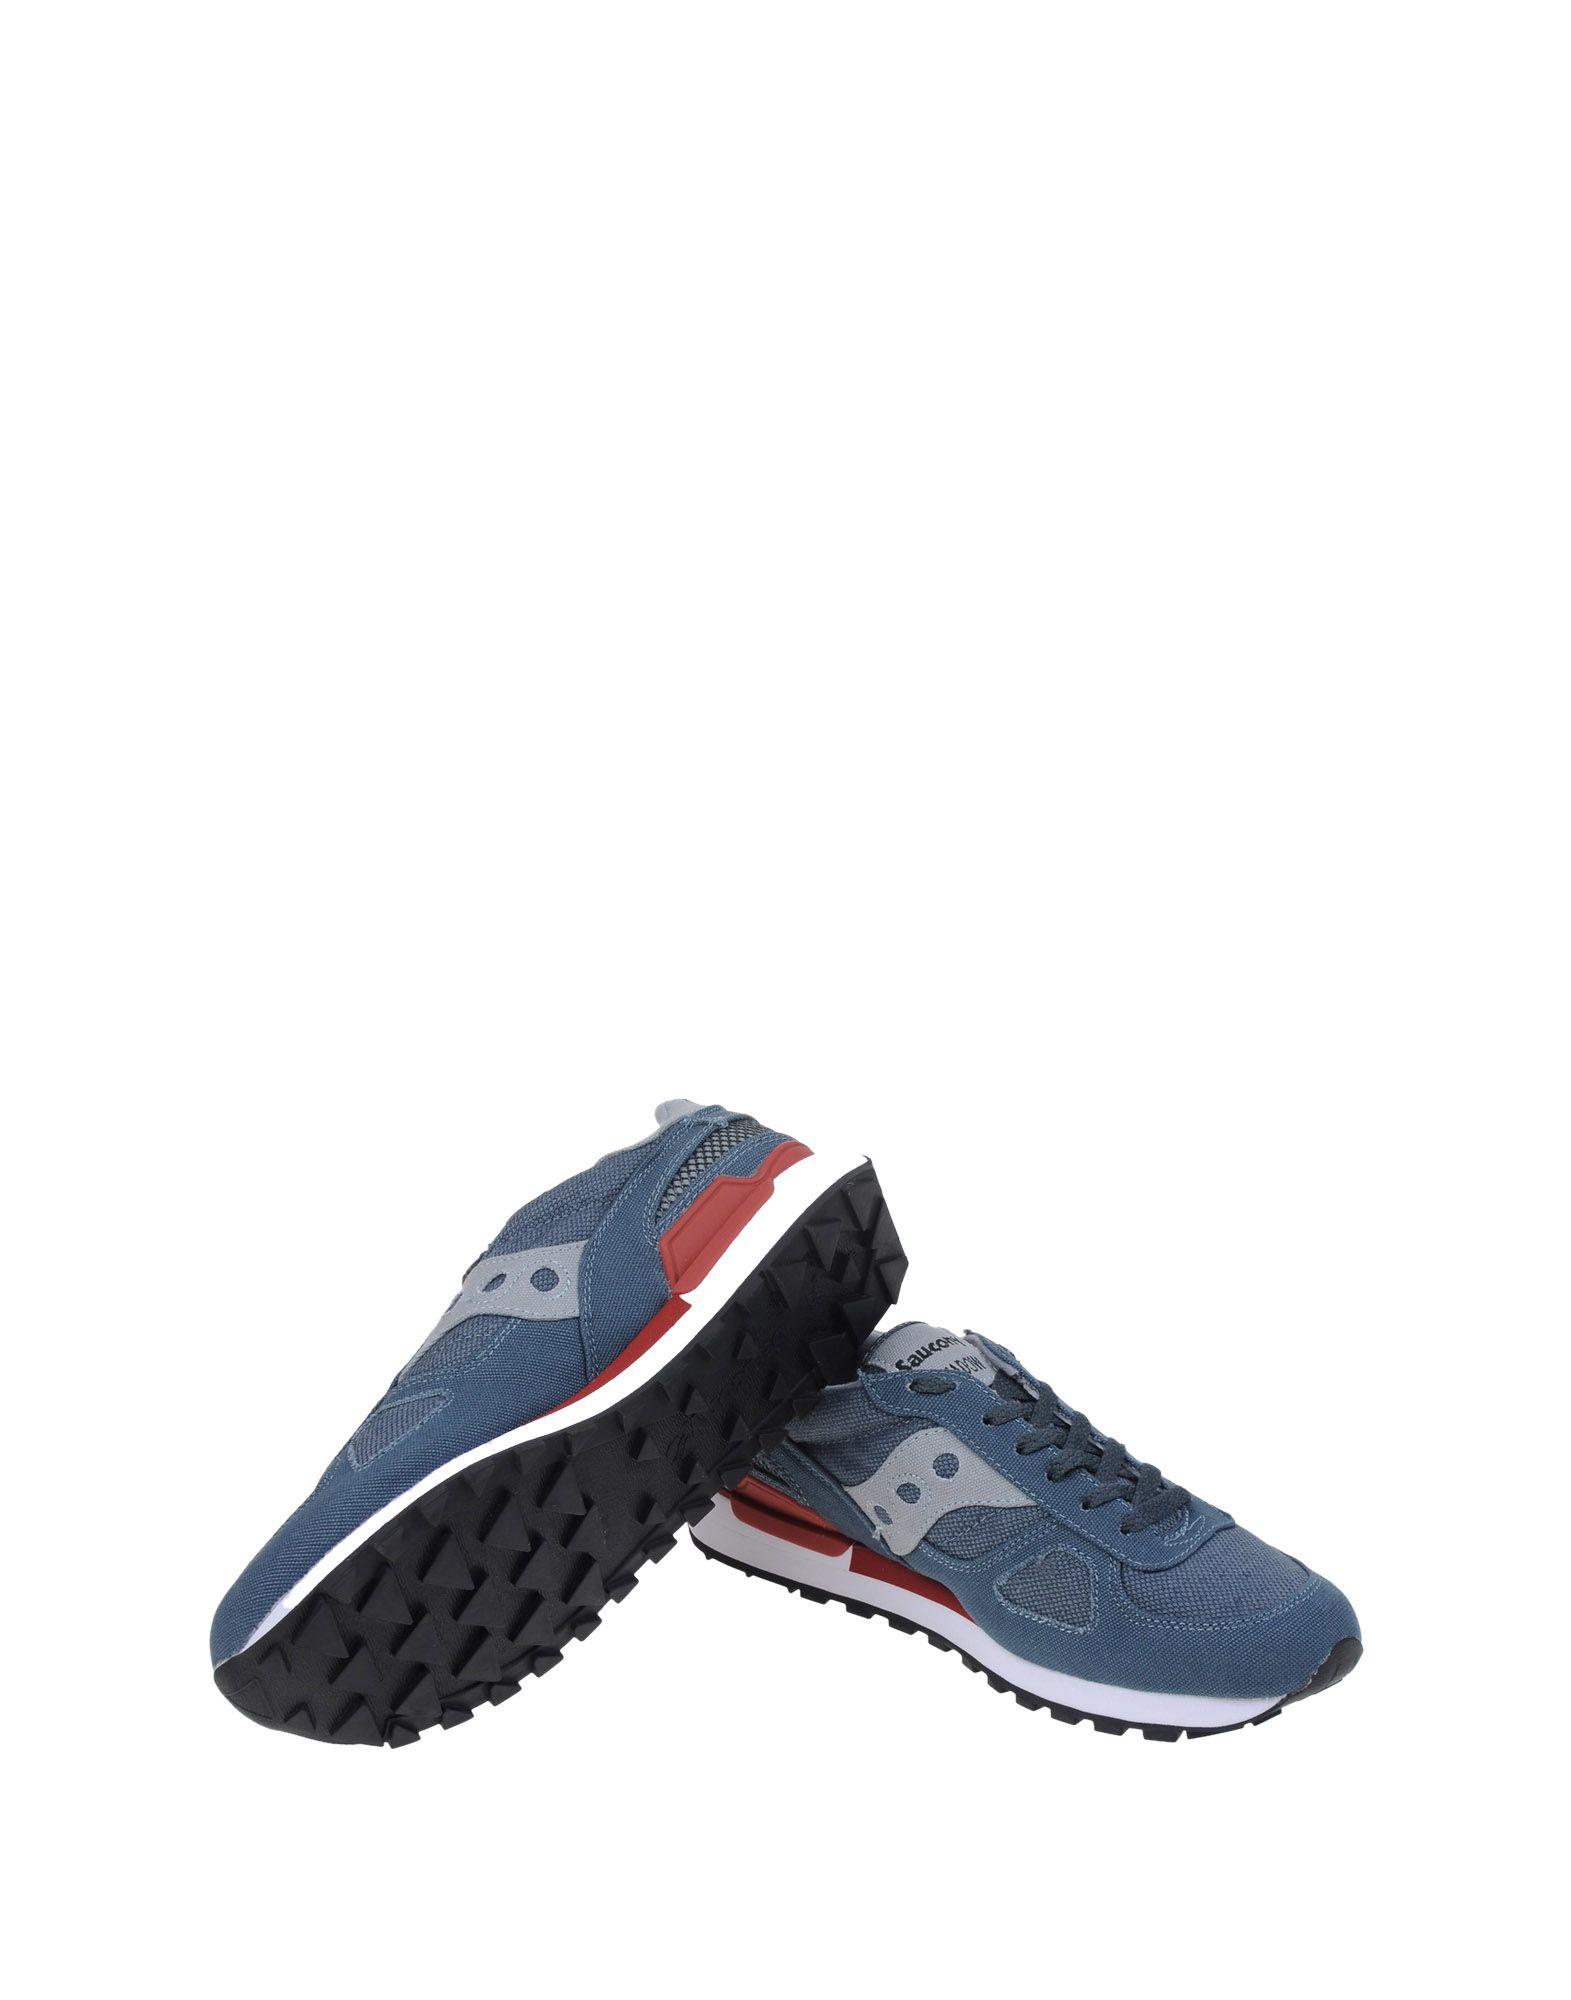 Sneakers Saucony Shadow O Vegan - Homme - Sneakers Saucony sur